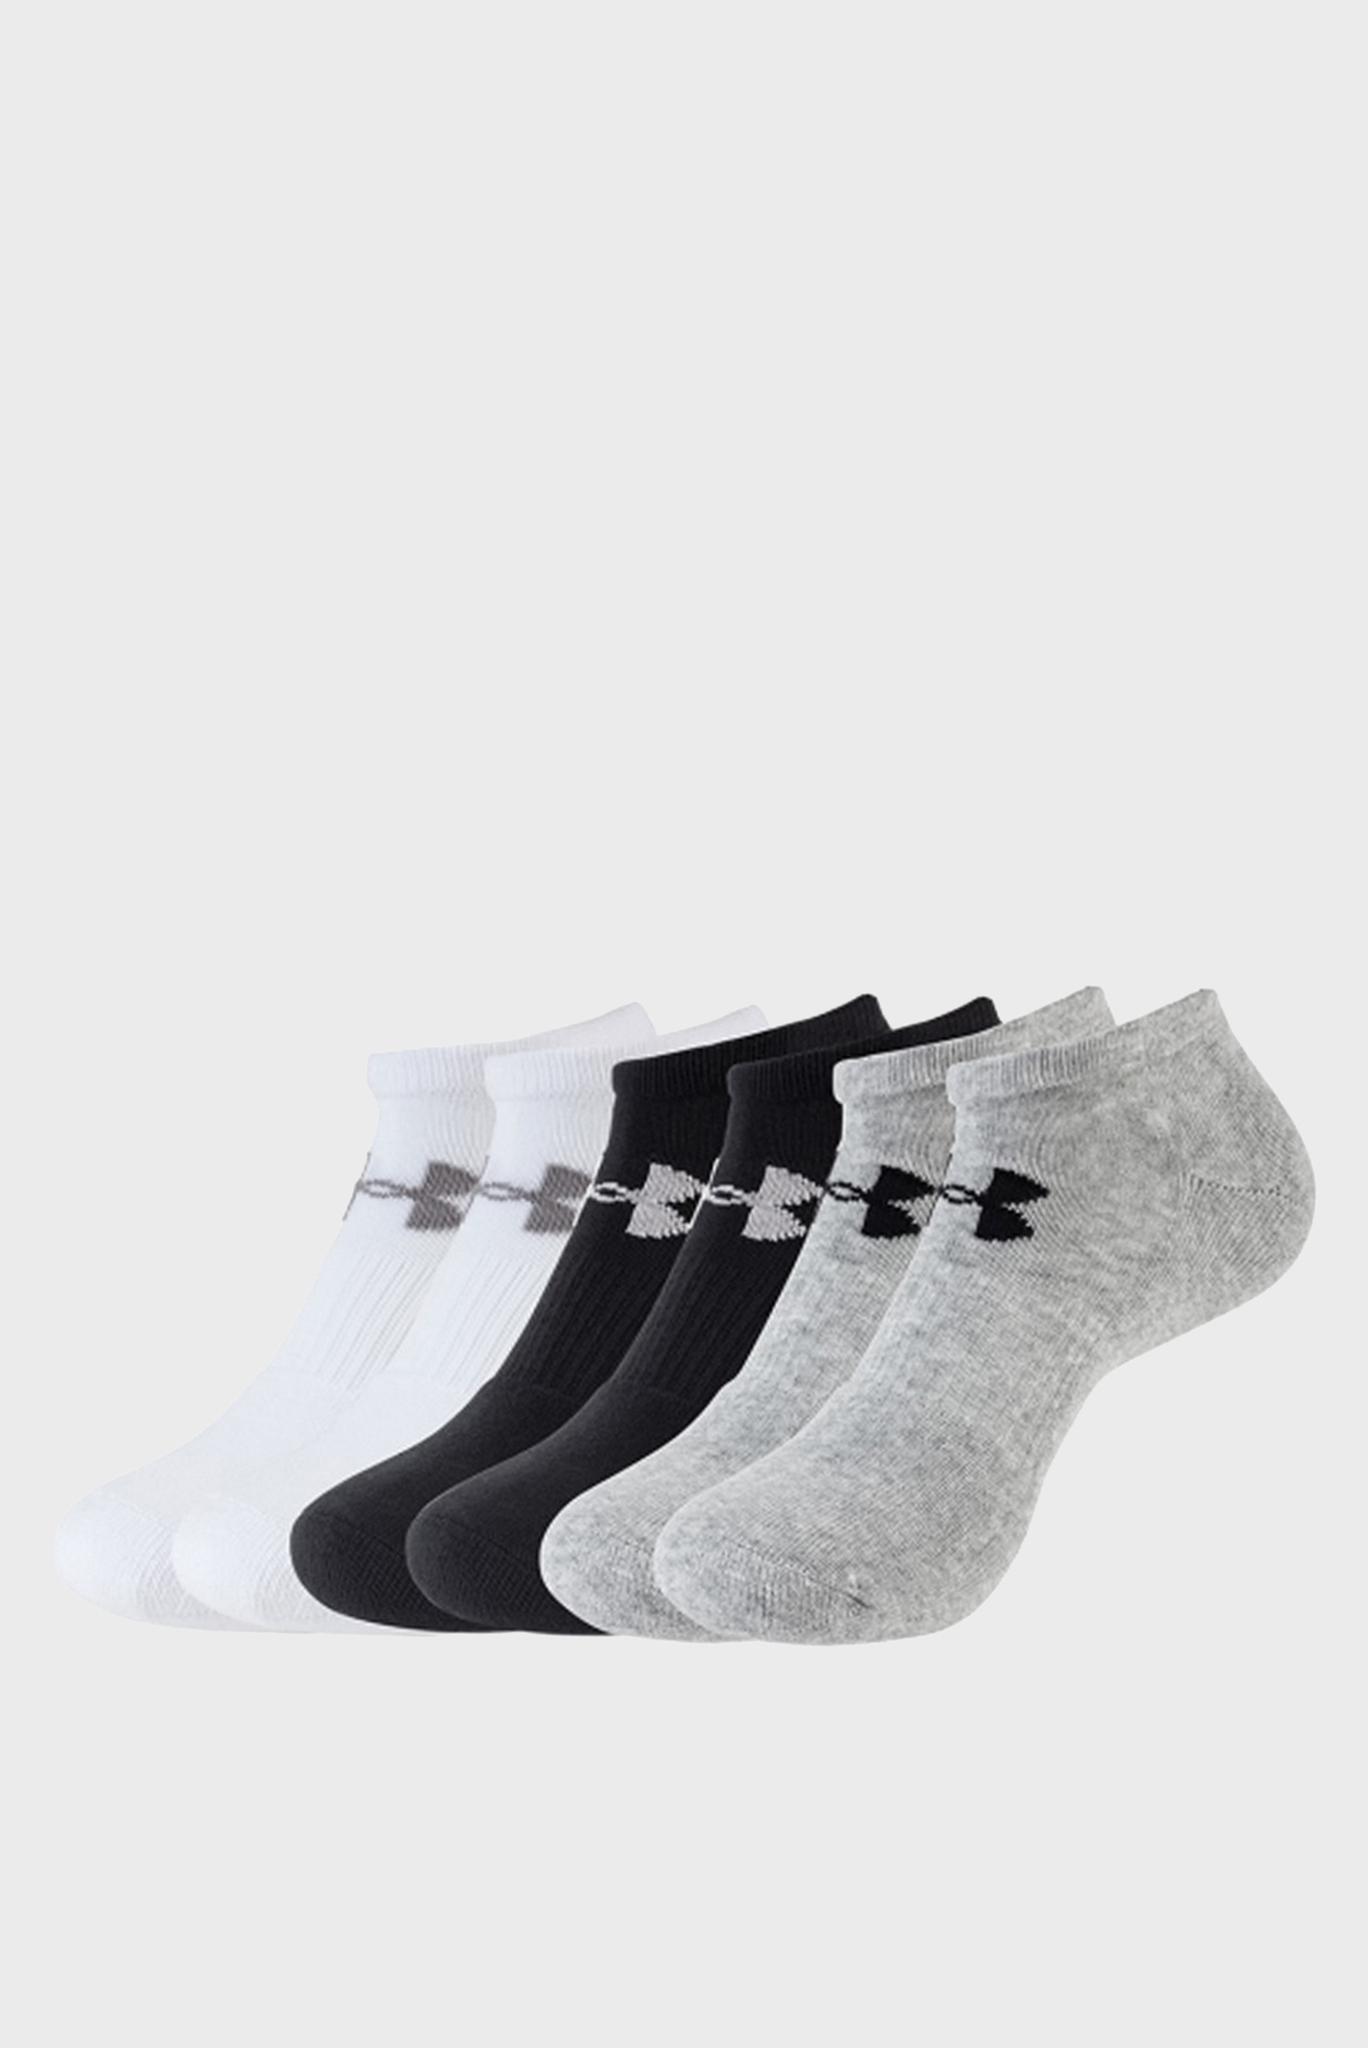 Мужские хлопковые носки (6 пар) CHARGED COTTON 2.0 NOSHOW Under Armour